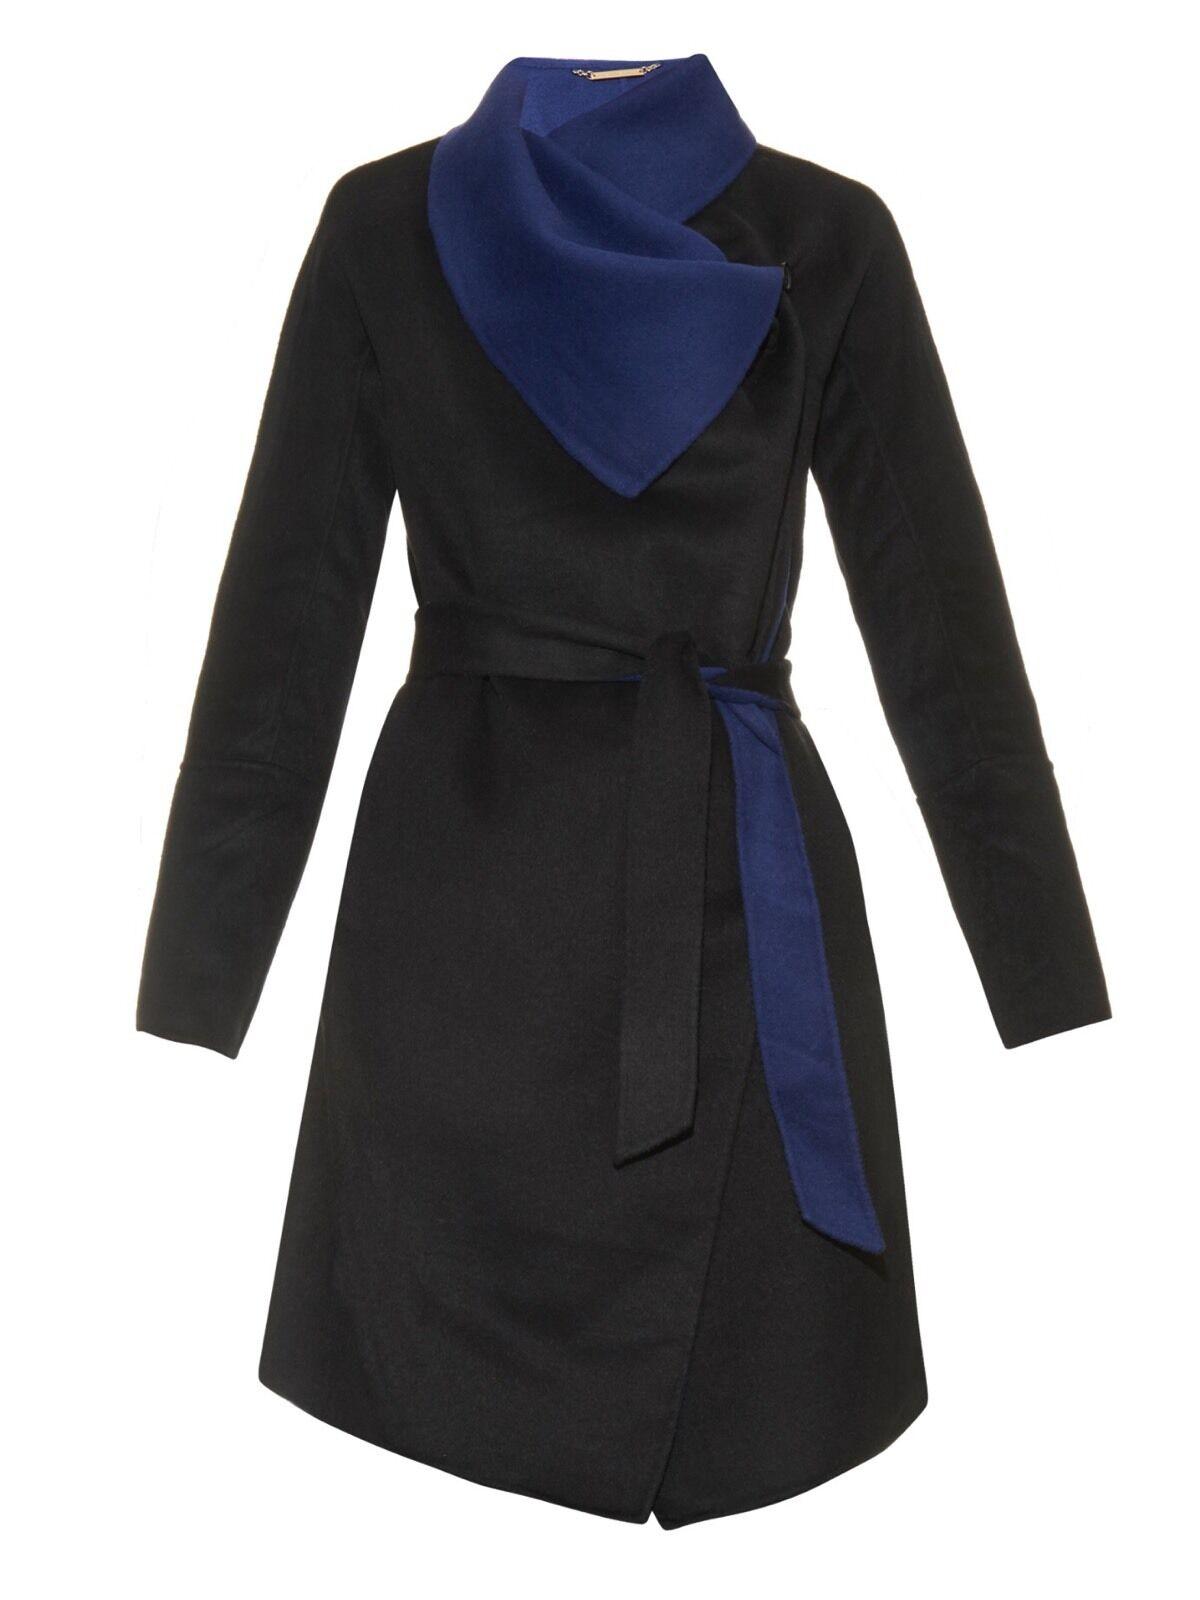 795.00 NWT Diane Von Furstenberg DVF Marilyn Coat Size Large L NEW